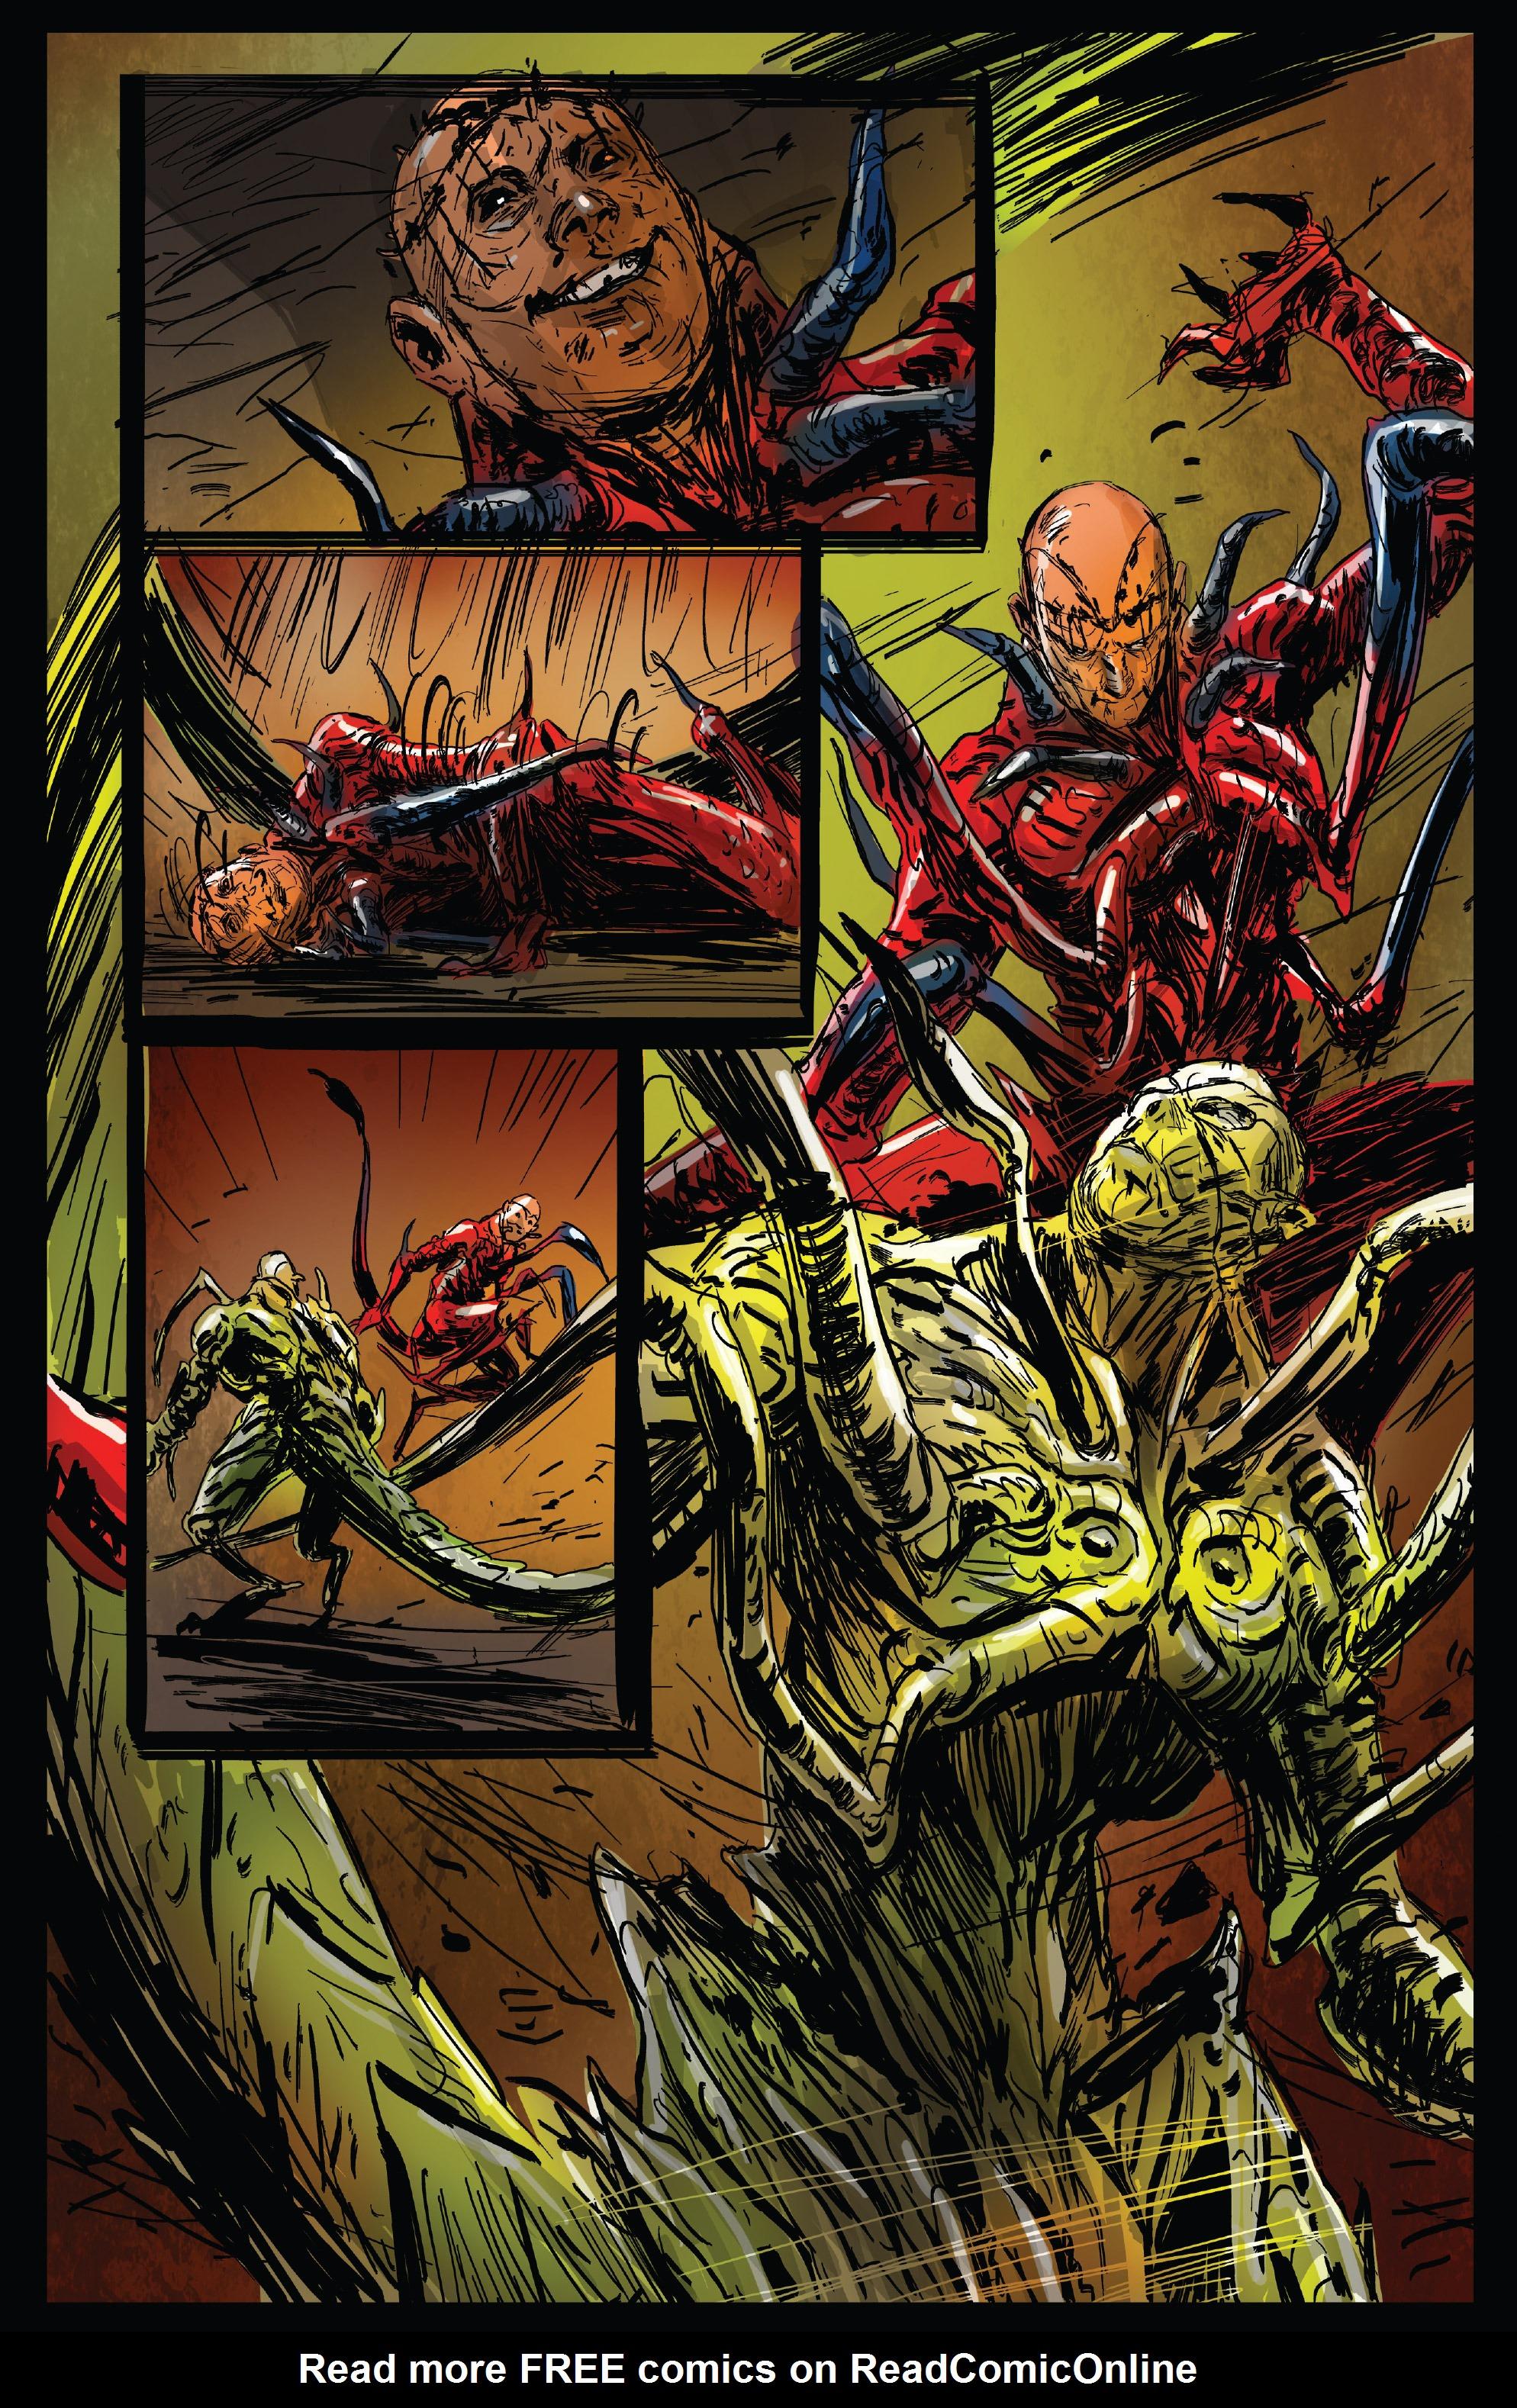 Read online Clive Barker's Hellraiser: The Dark Watch comic -  Issue # TPB 3 - 12